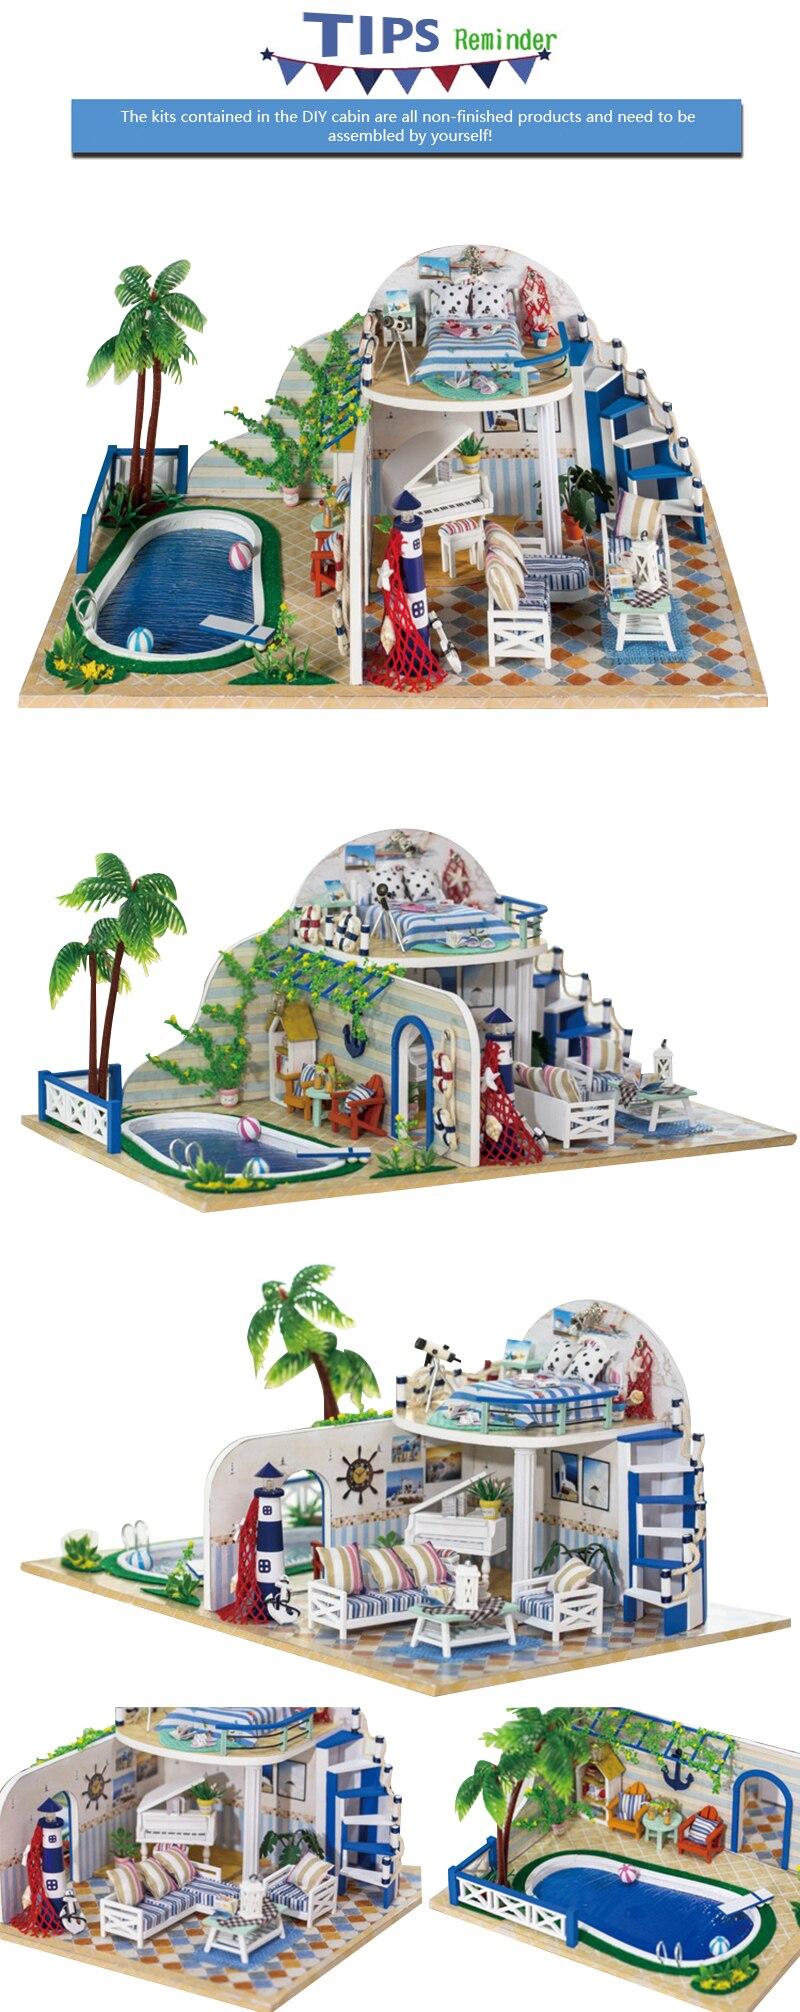 Dolls & Stuffed Toys Doll Houses Diy Miniature Dollhouse Room Kit Clear Summer Villas Little Prince Rose Blue Sea Legend Wooden Christmas Gift Toys For Children